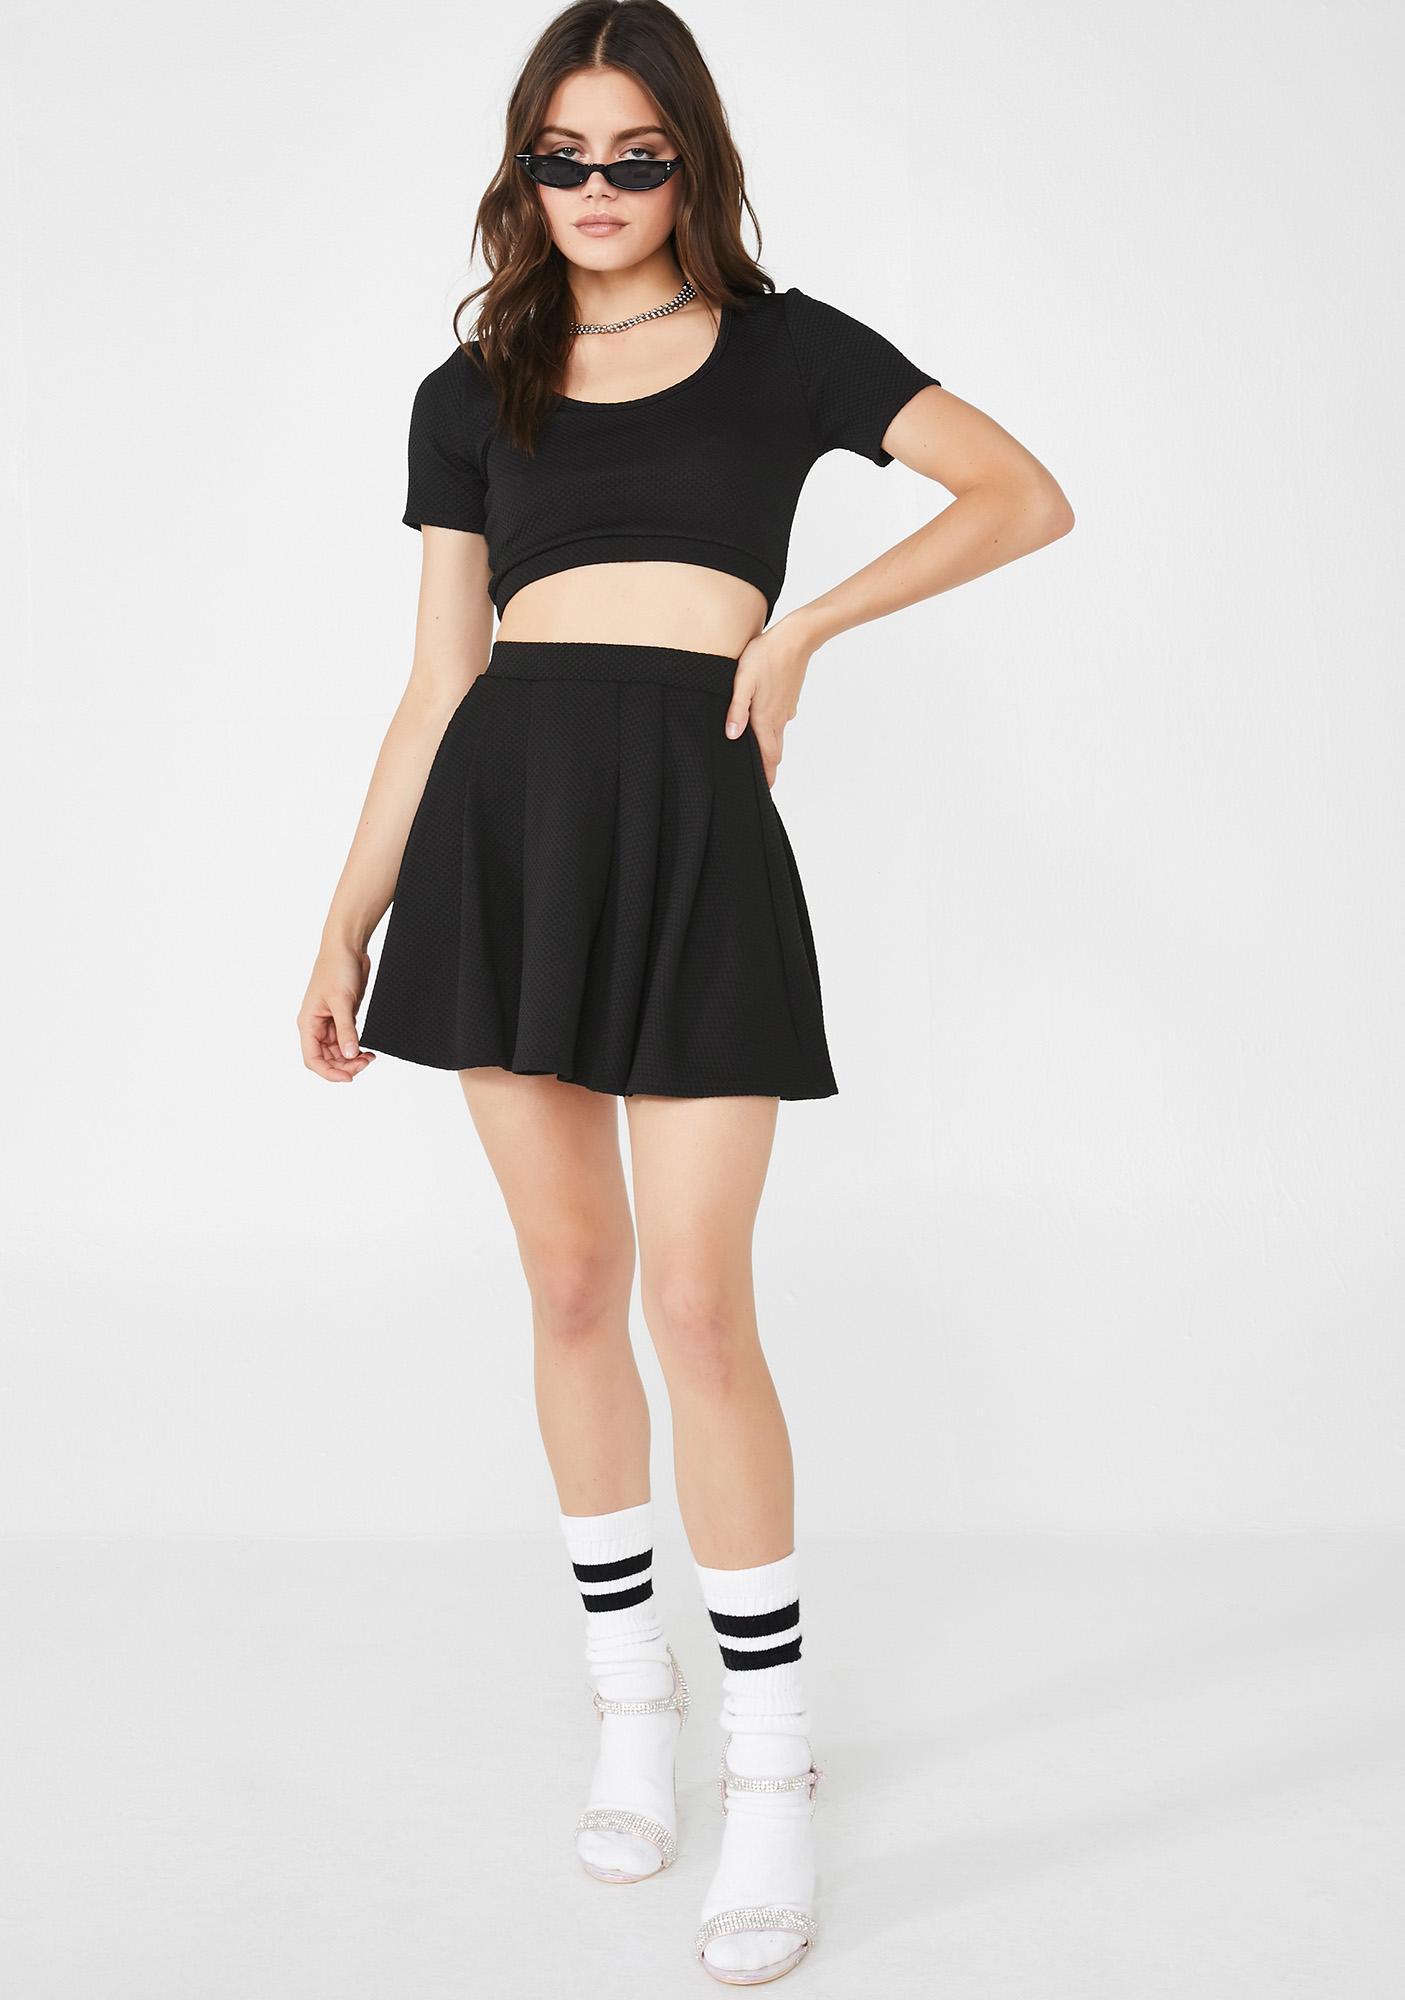 Tragic Classic Heartbreaker Skirt Set